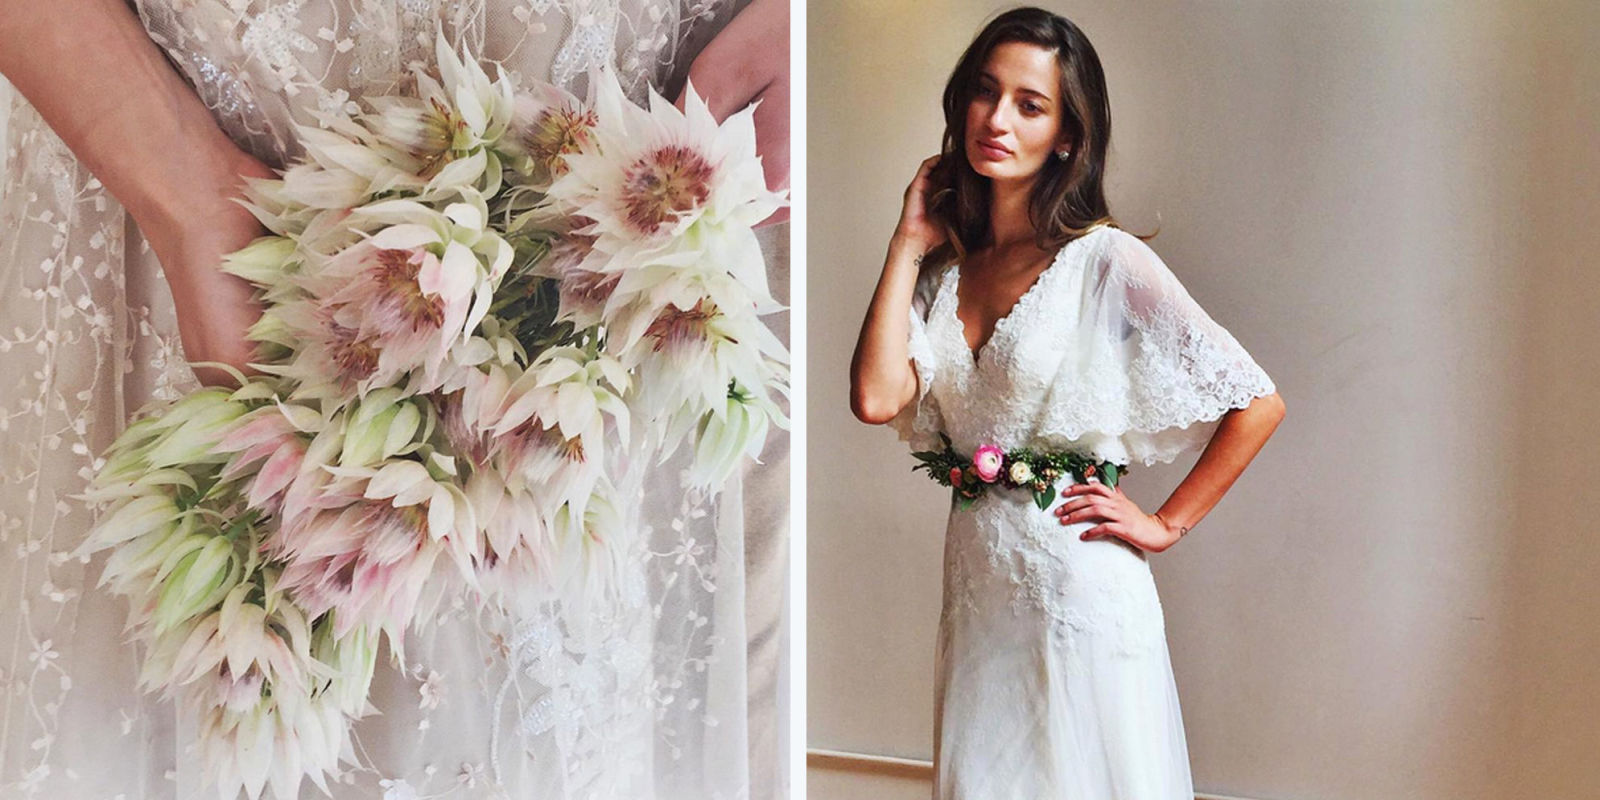 wedding dress styles for fall kohls wedding dresses Wedding Dress Styles For Fall 66